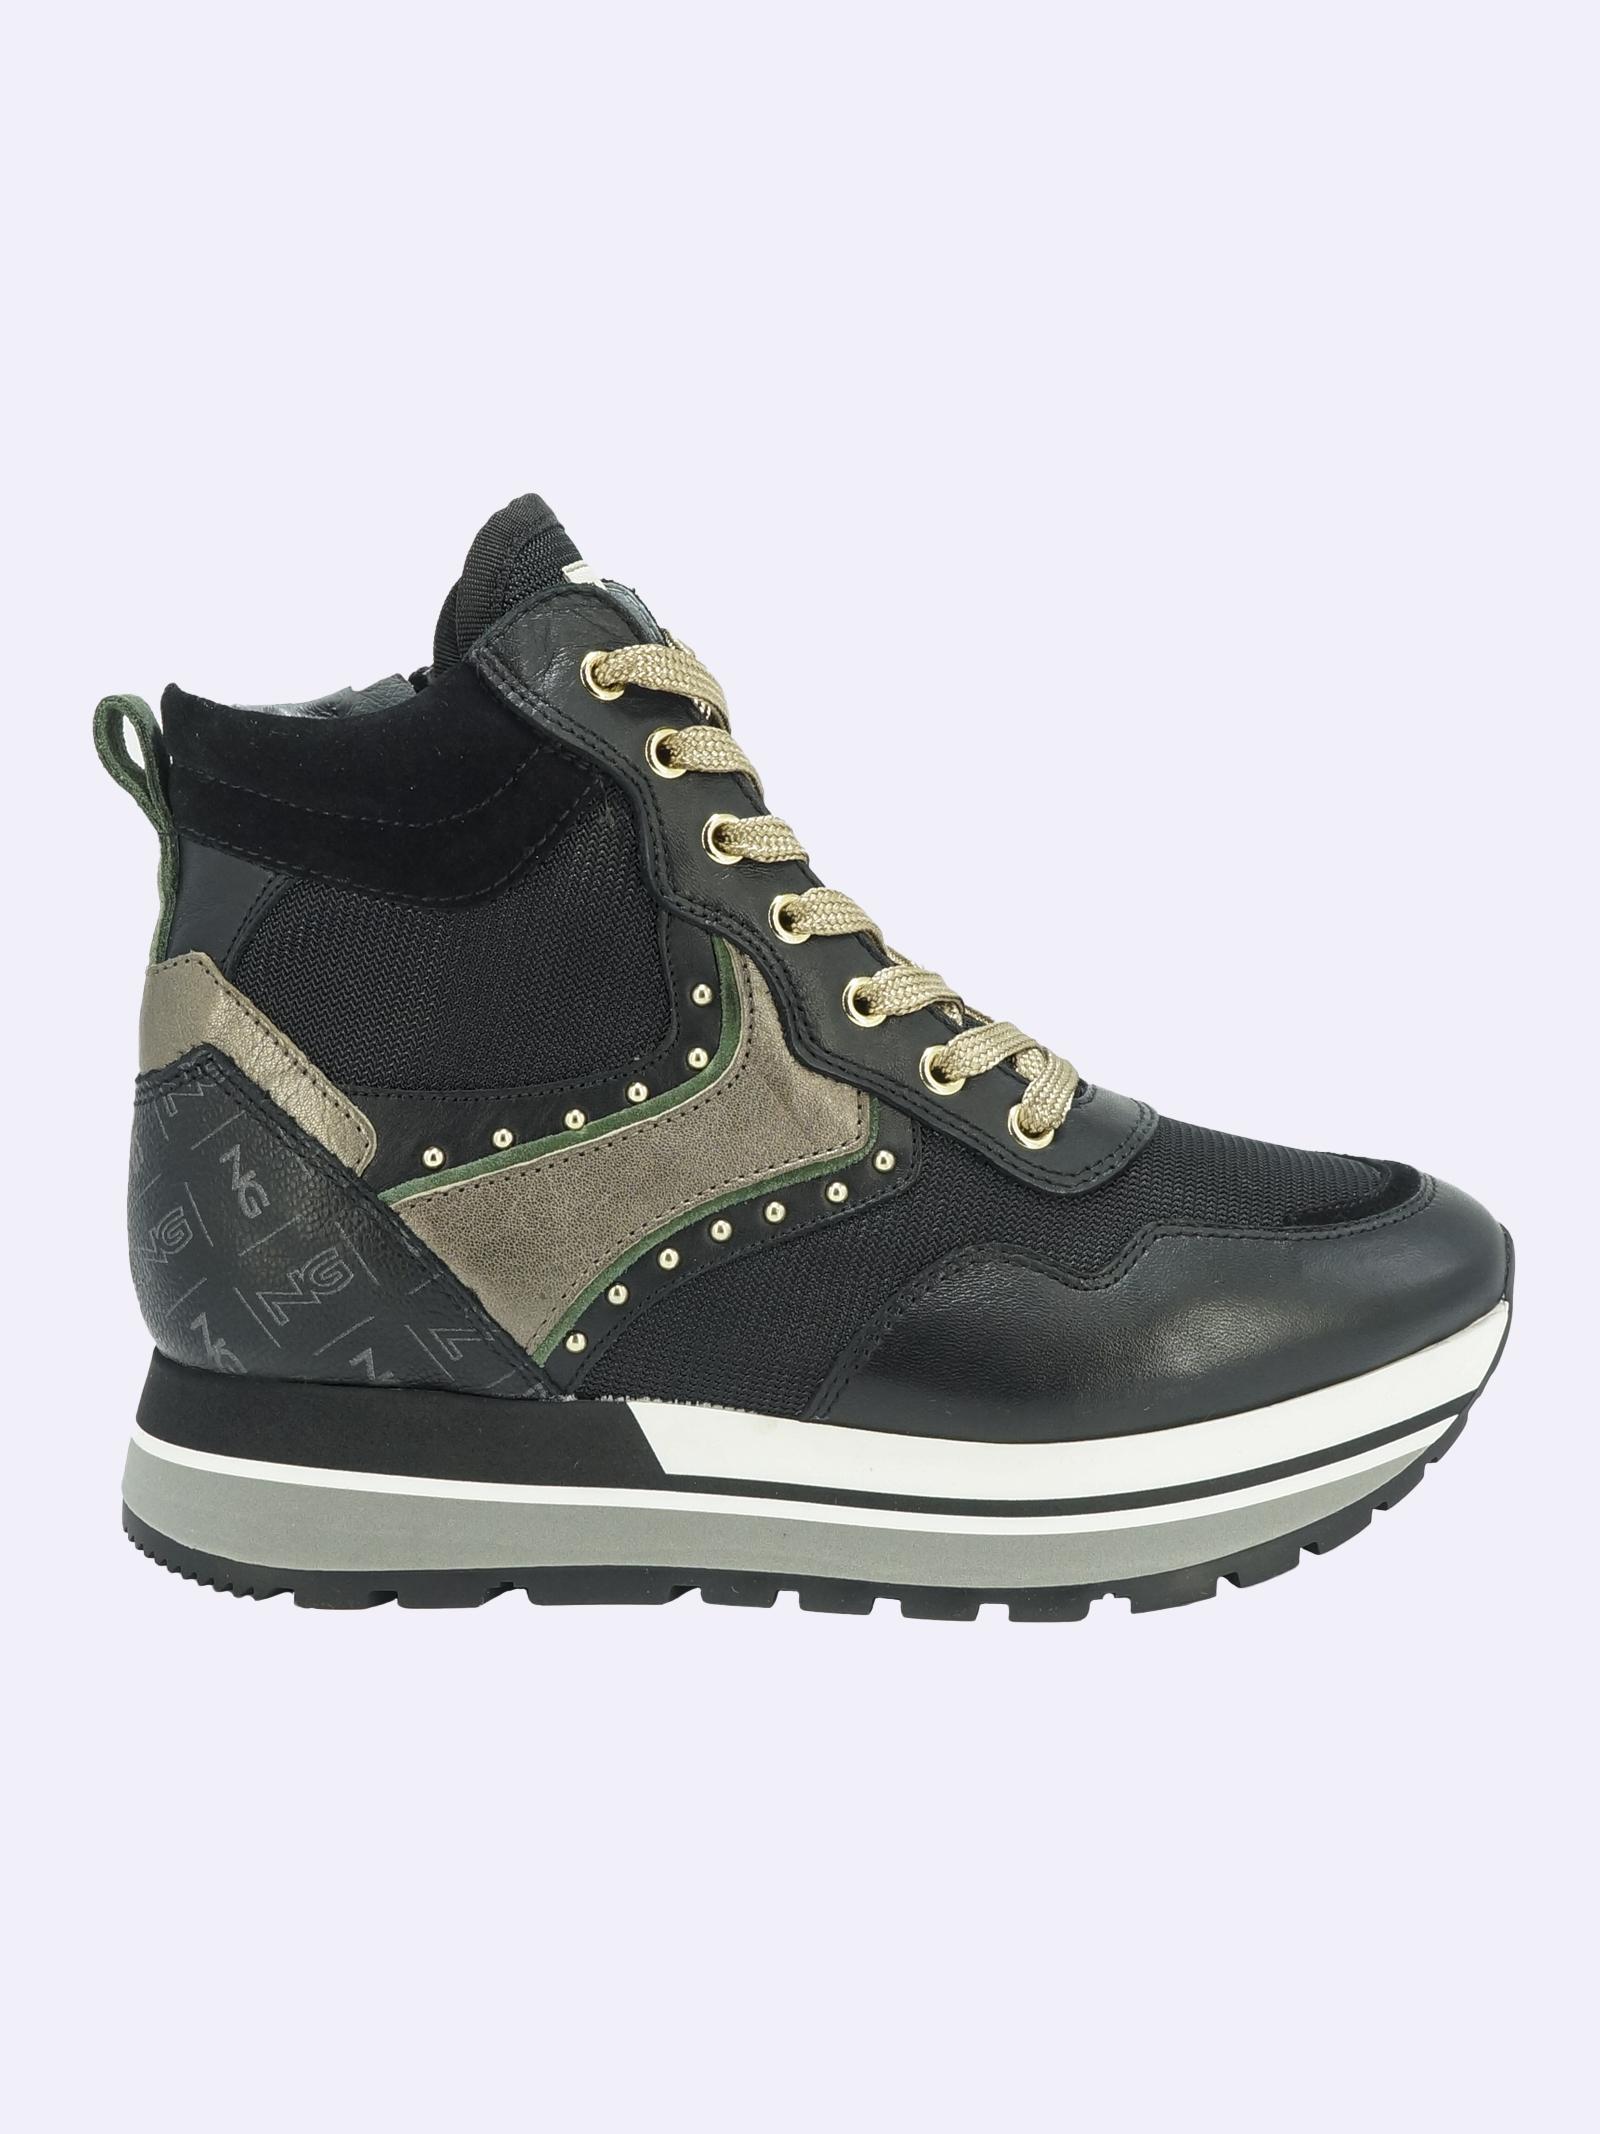 Sneakers Donna in Pelle Nero Giardini Nero Giardini | Sneakers | I116943D100